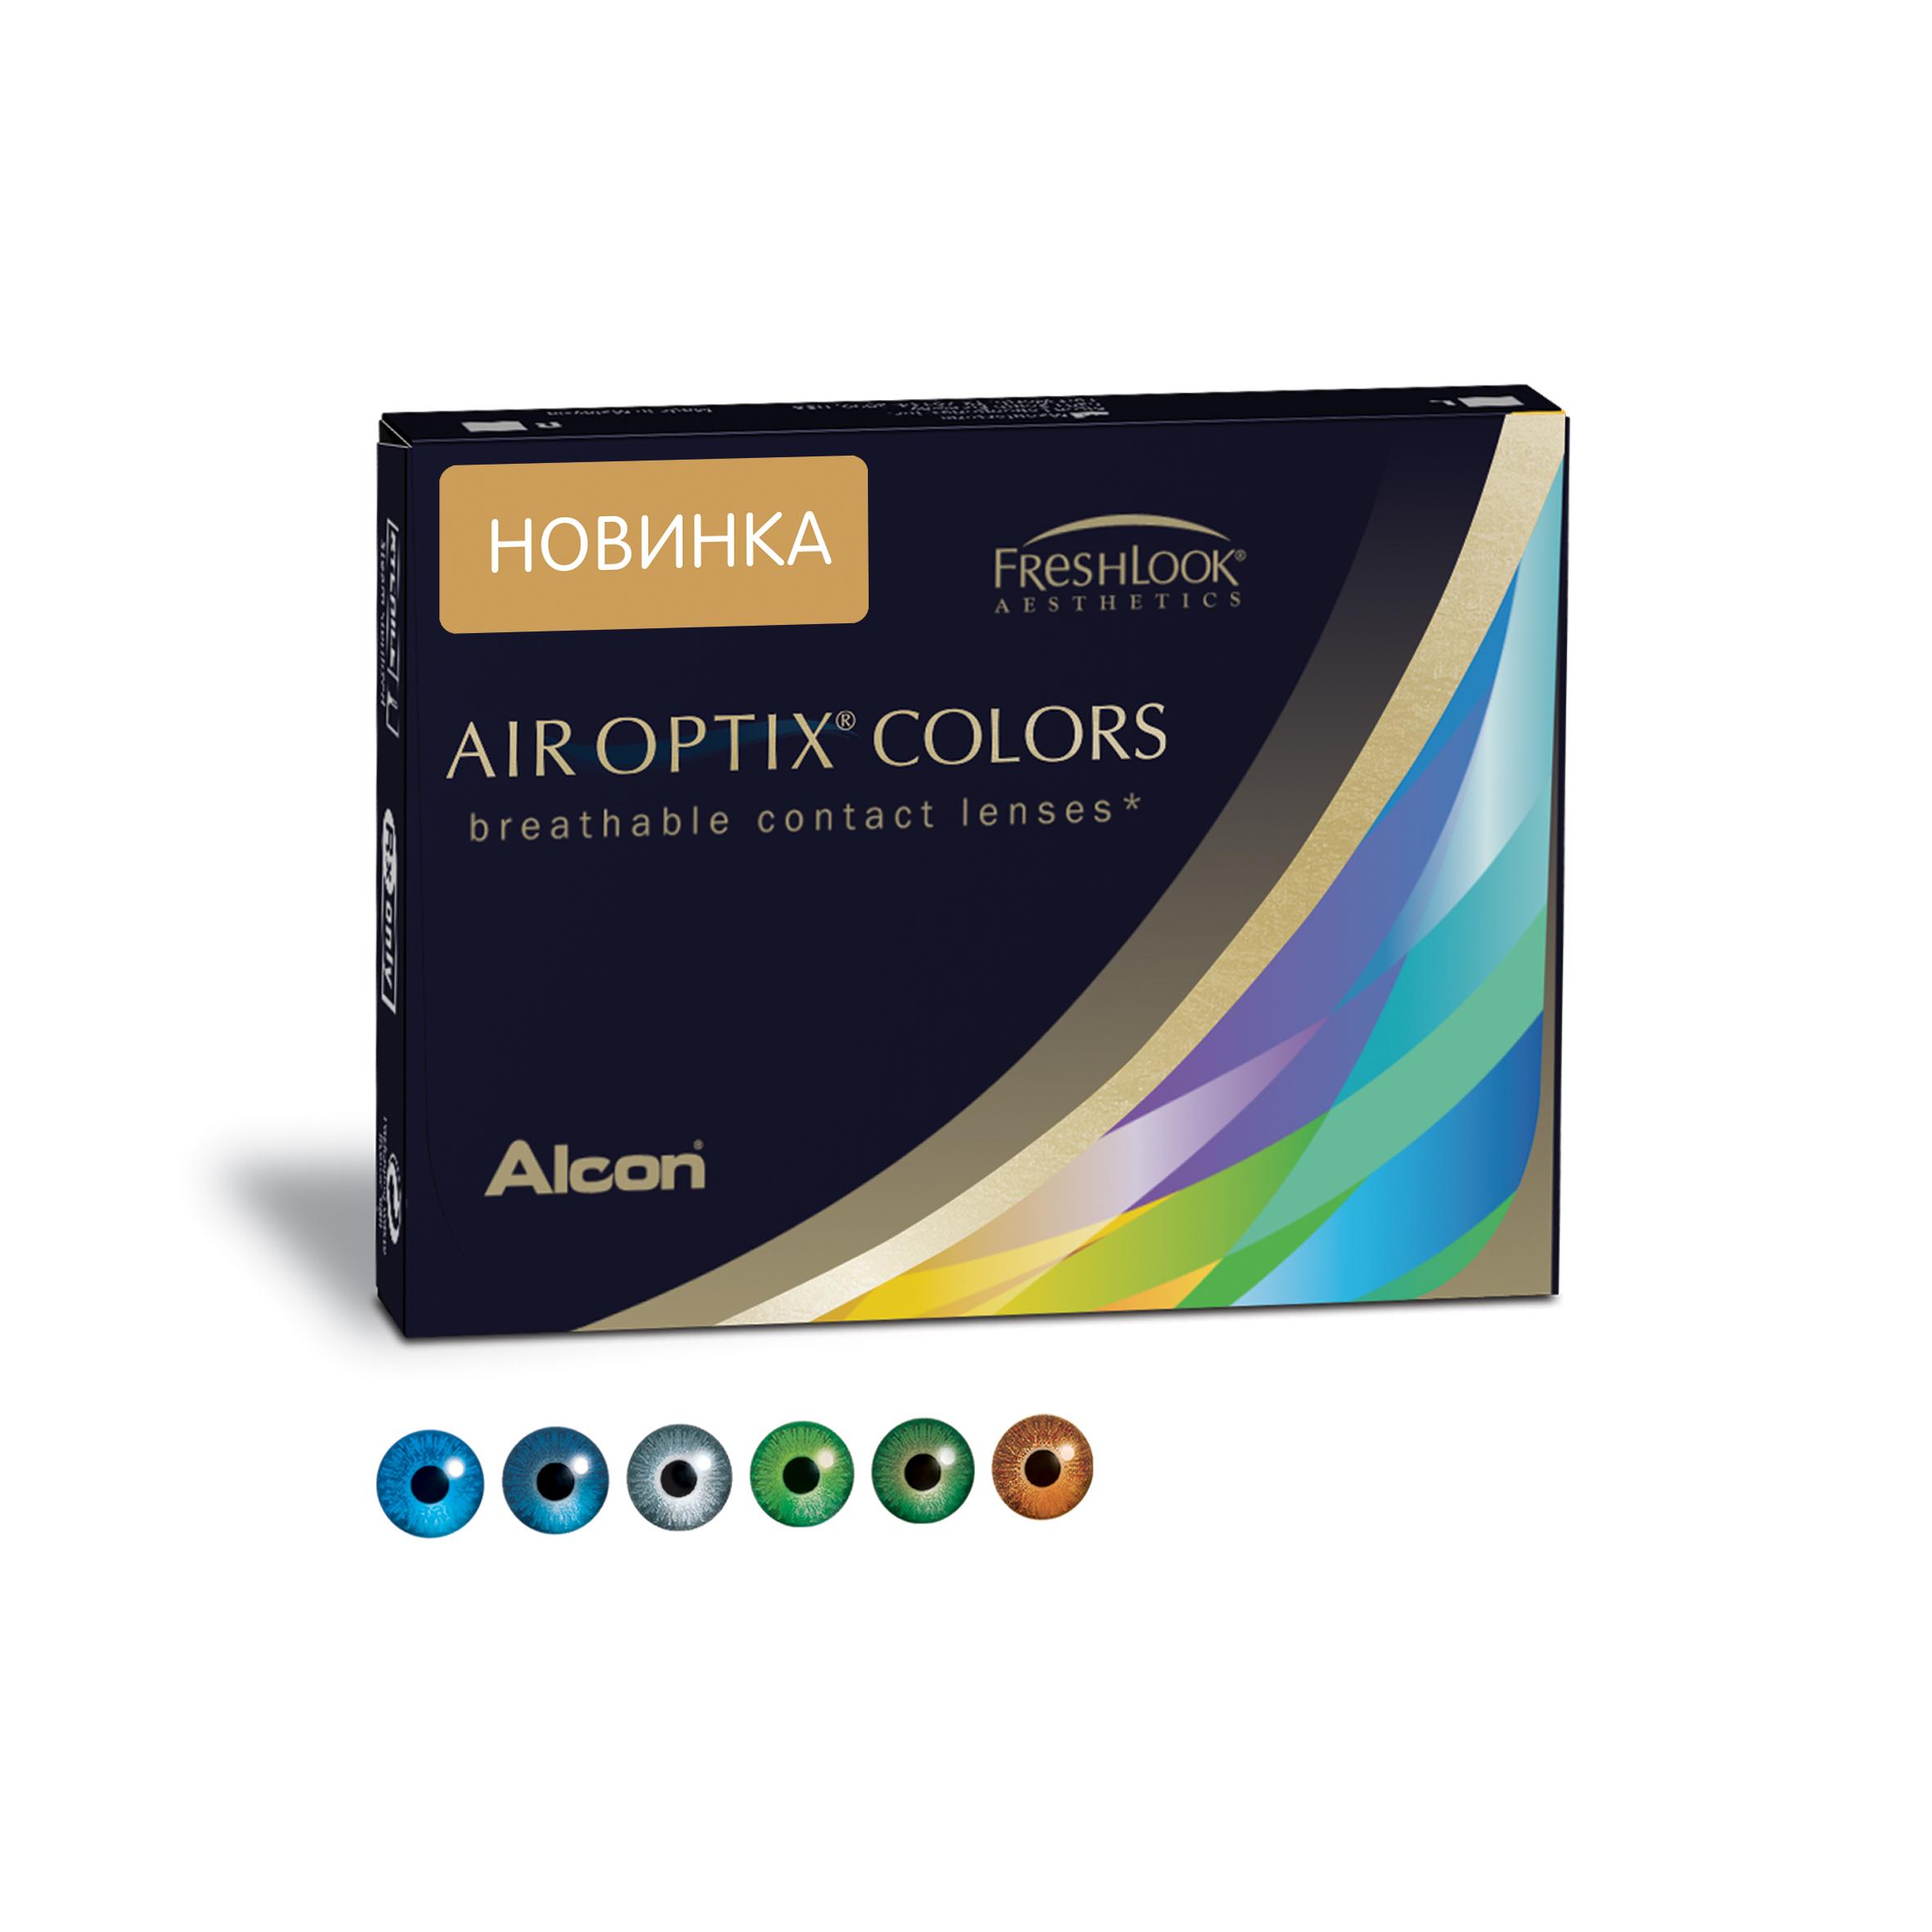 Аlcon контактные линзы Air Optix Colors 2 шт -0.25 Honey31746100Мягкие контактные линзы